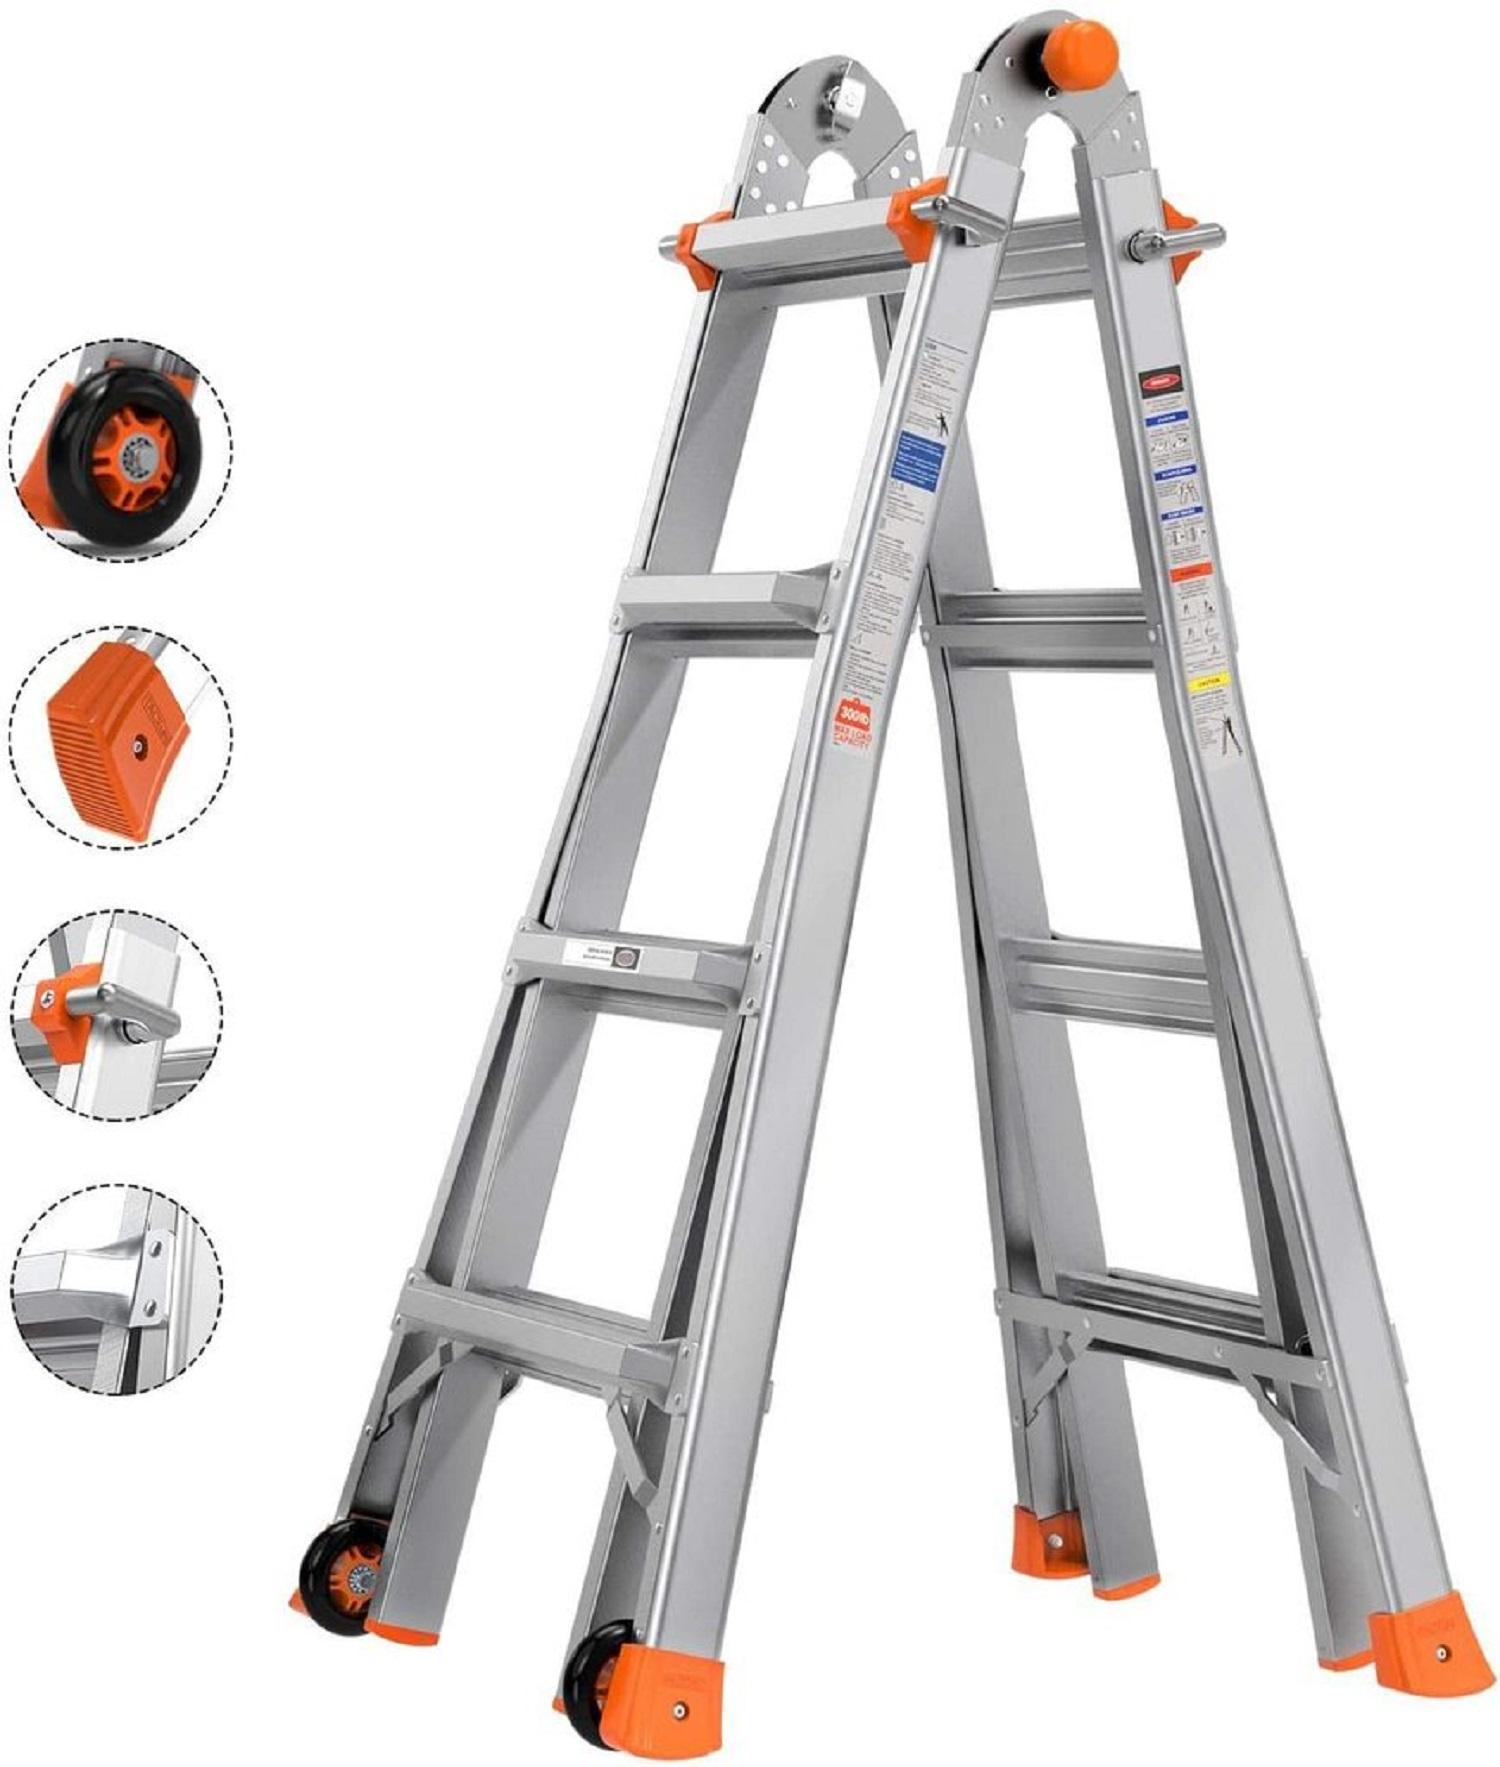 Tacklife 17ft Telescoping Ladder